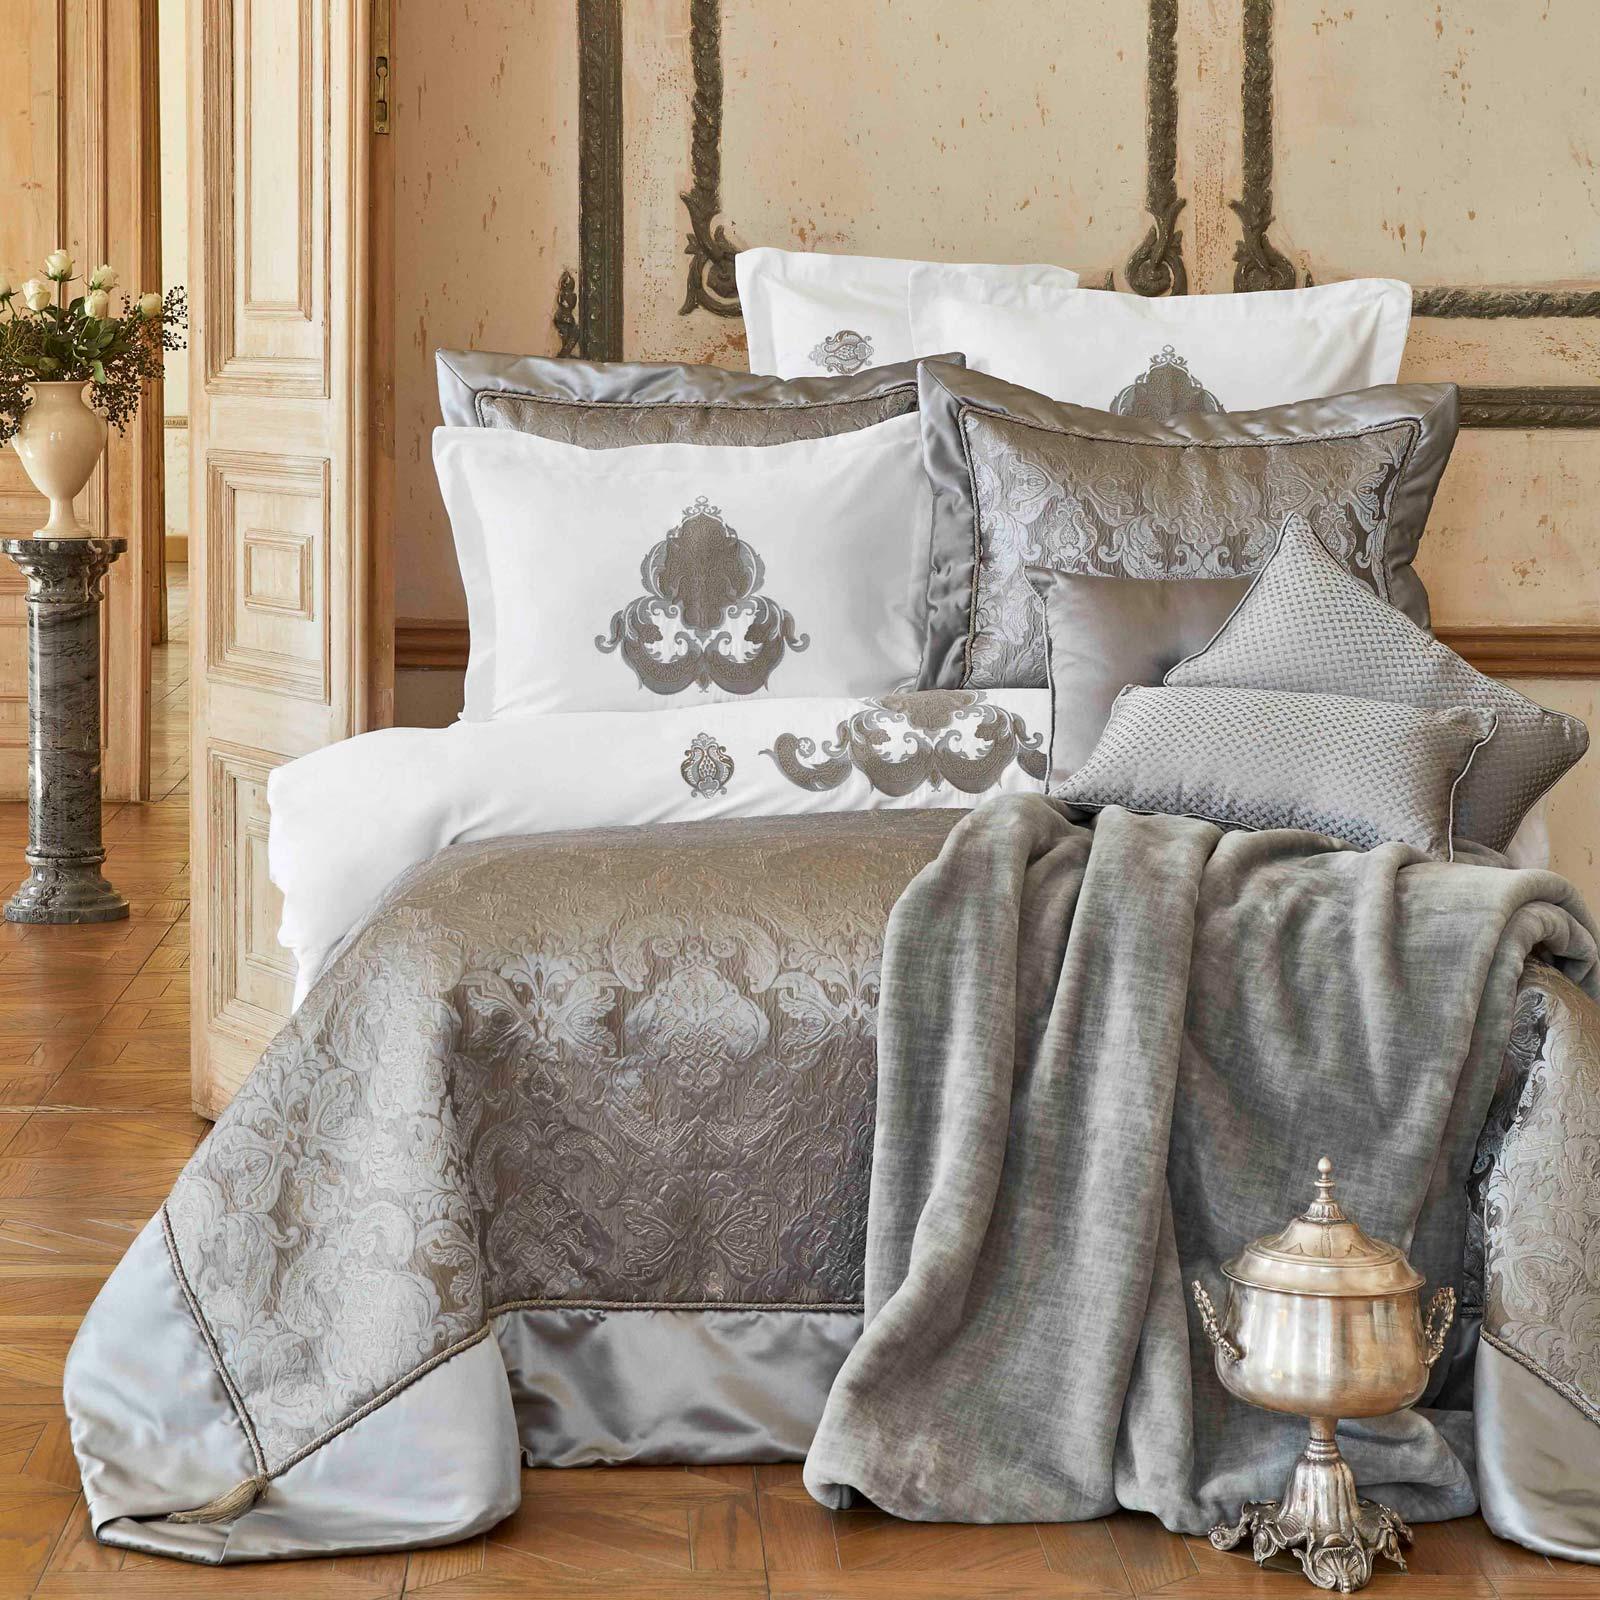 Karaca Home Cornelia Antrasit 6 Parça İpek Private Yatak Örtüsü